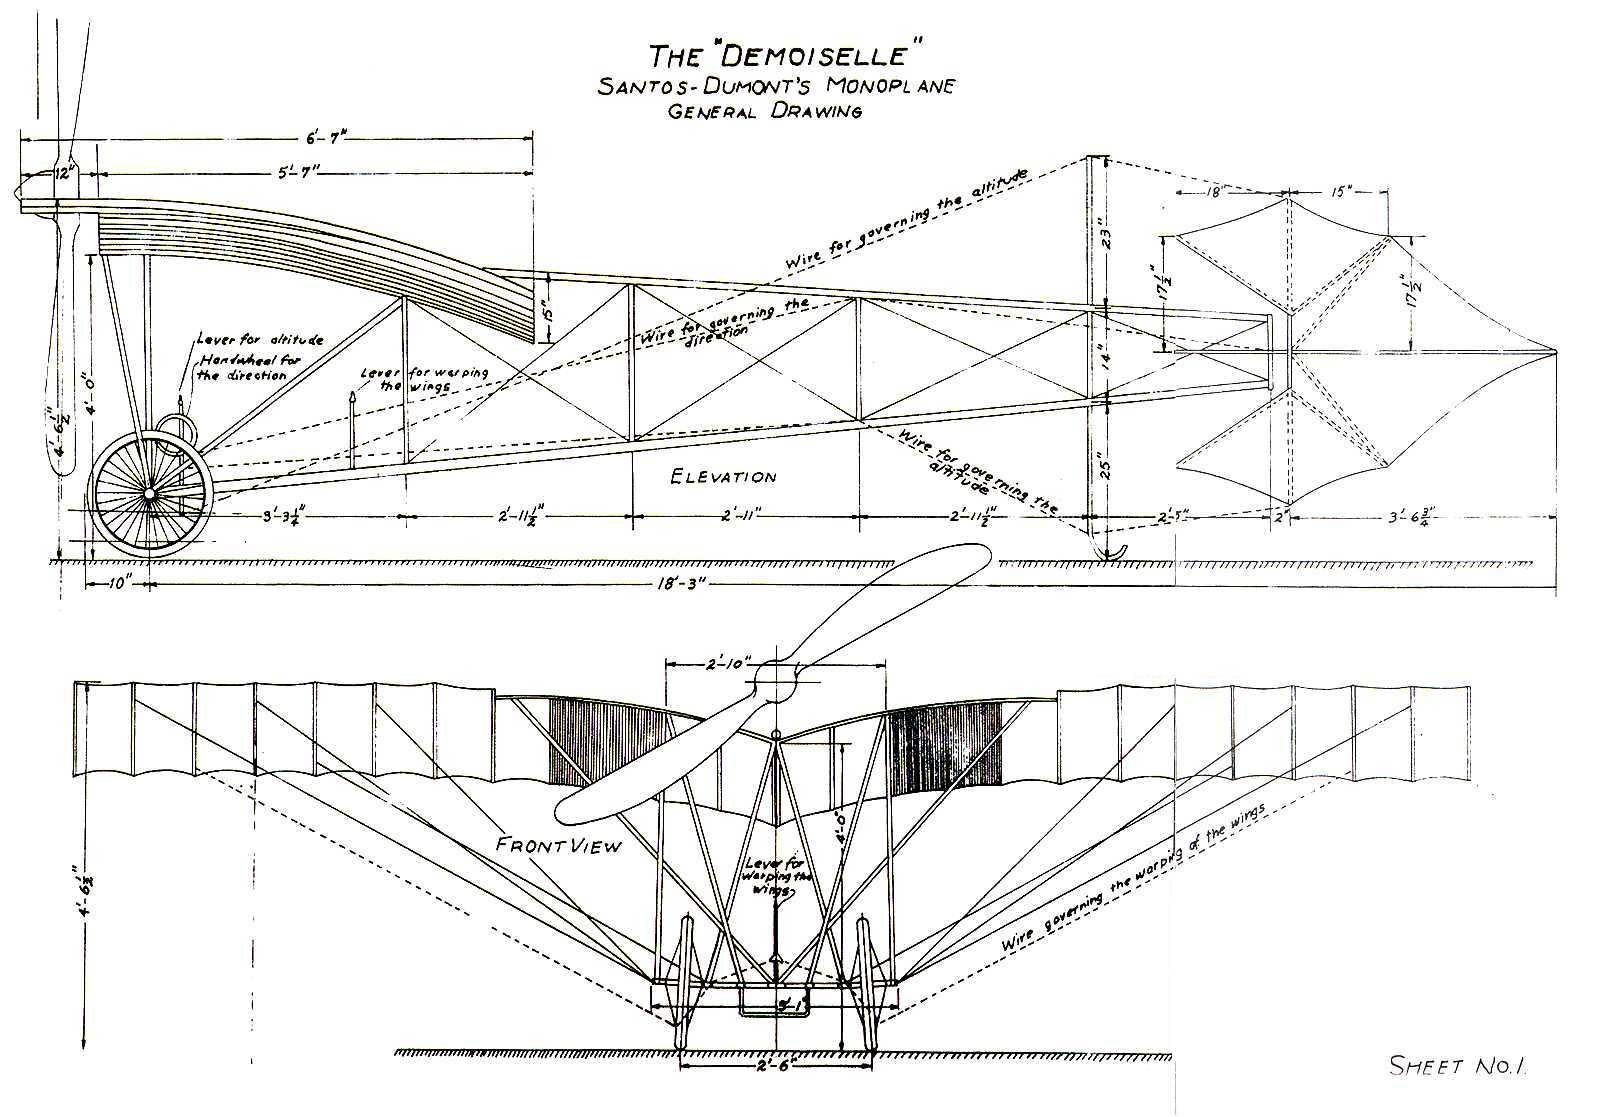 pietenpol wiring diagram first flight - centennial flight - santos-dumont - wright ... #15